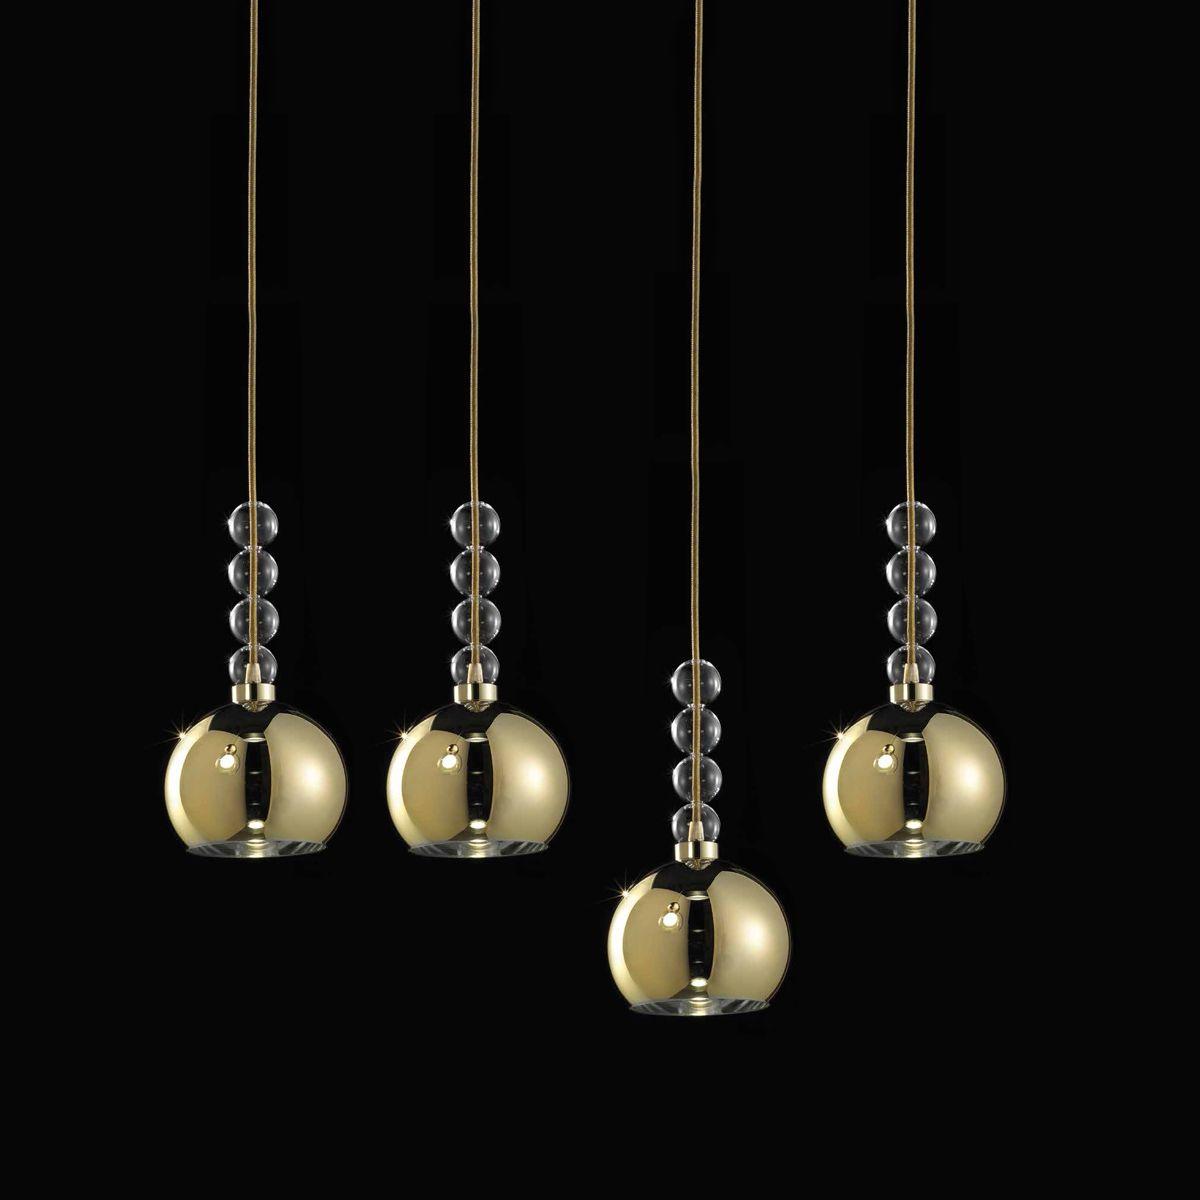 Memoria designed by Dima Loginoff for EVISTYLE www.evistyle.com #evistyle #luciitaliane #dimaloginoff #memoria #memorialamp #production #lamp #lighting #light #design #isaloni #milano #euroluce #interior #interiordesign #milan #glass #luce #interni #decor #casa #home